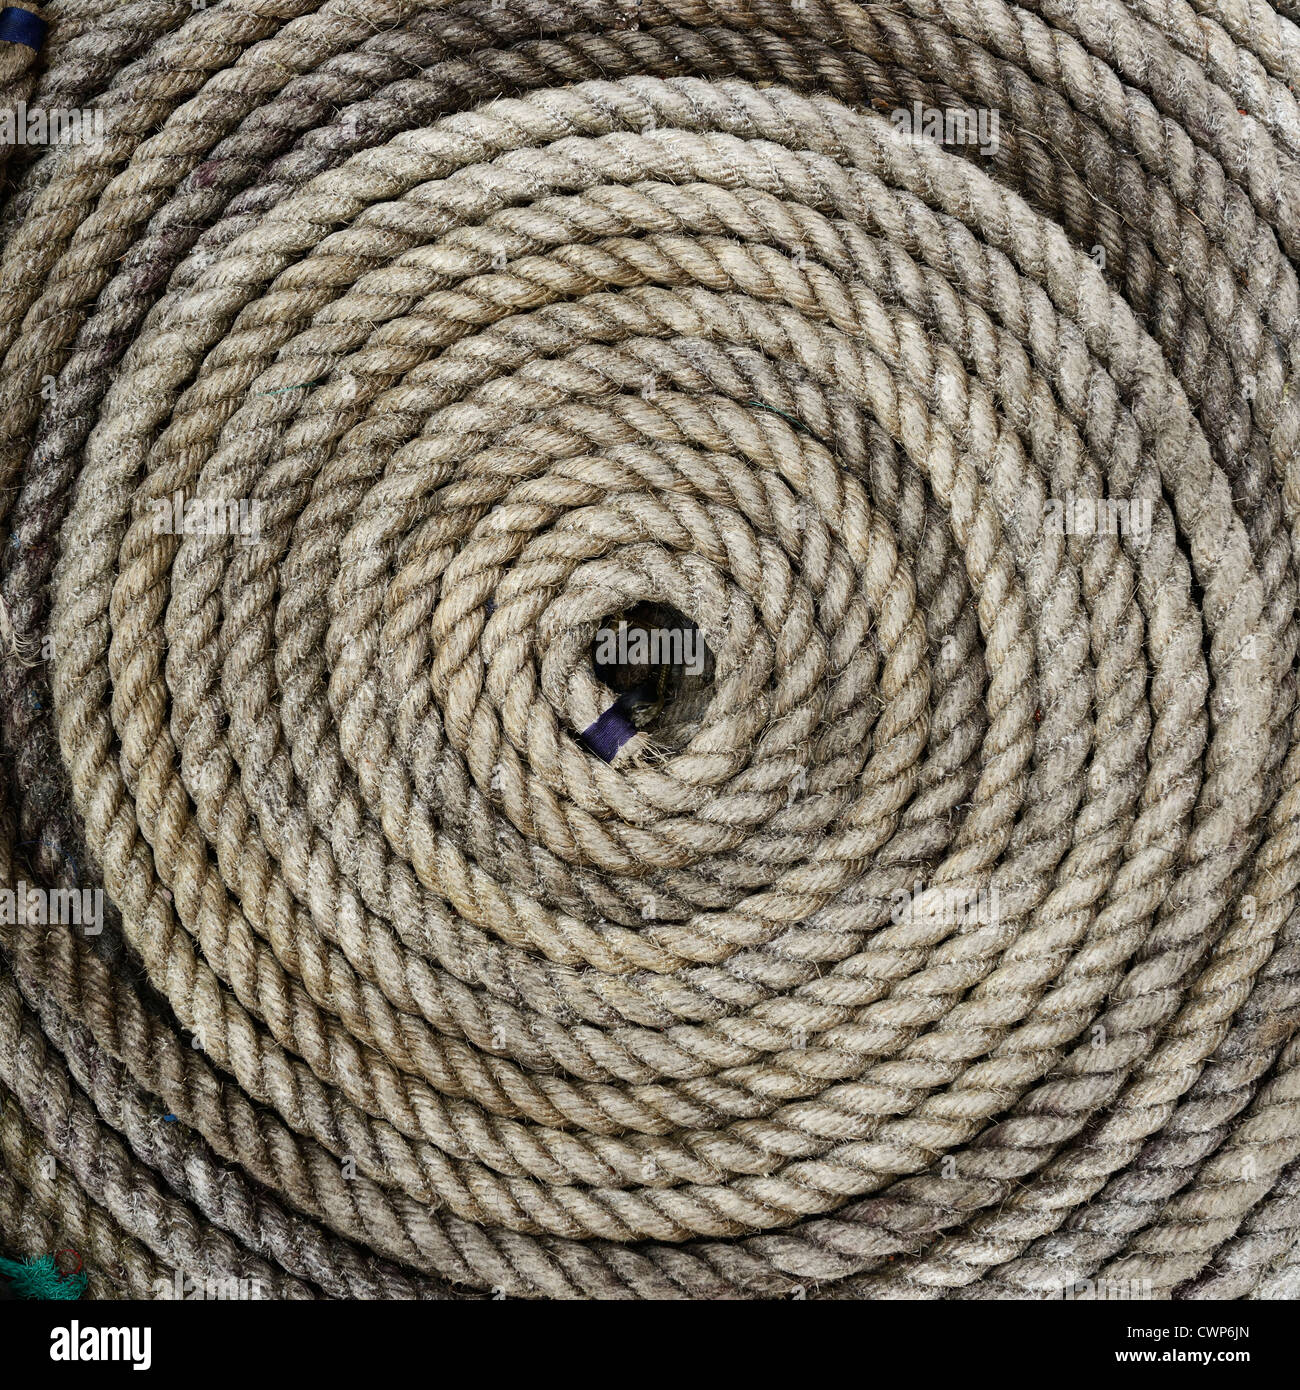 Bobina de cuerda Imagen De Stock